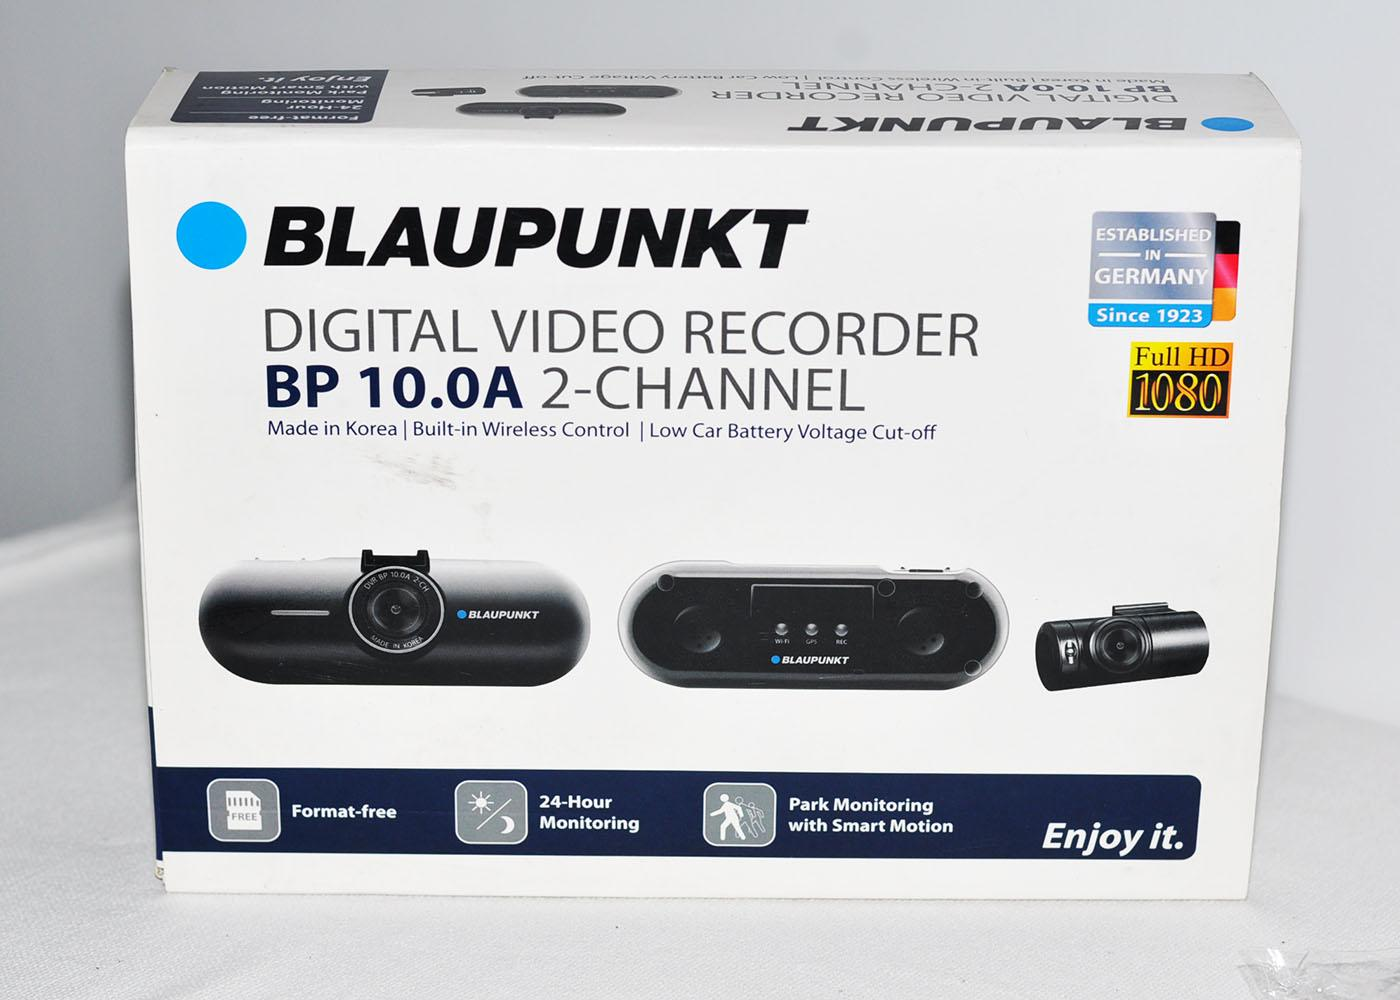 Blaupunkt Philippines: Blaupunkt price list - Earphones, Headphones